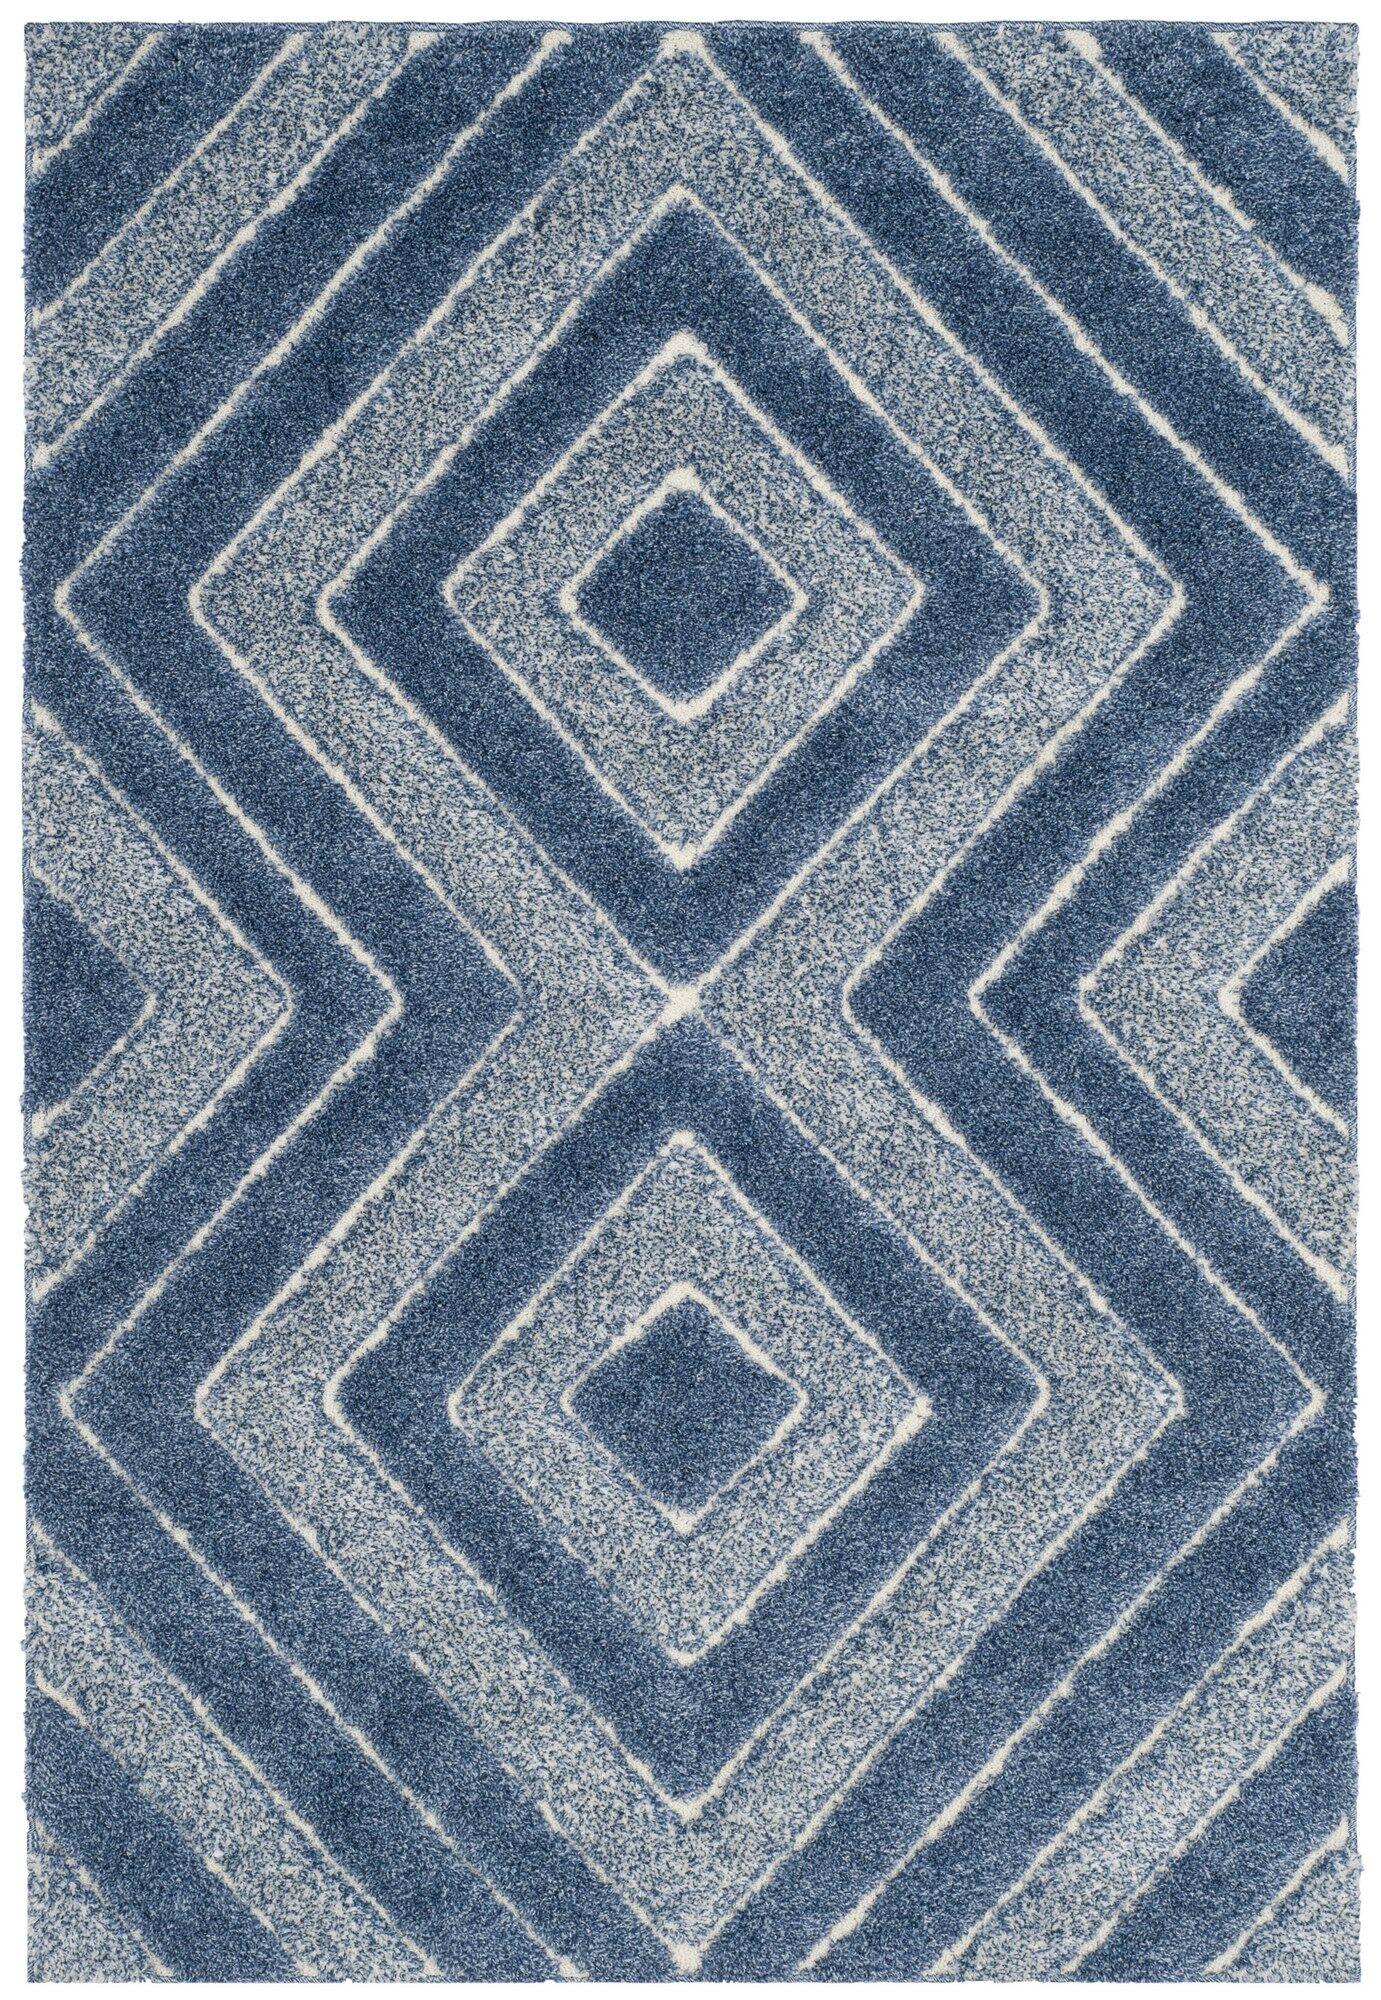 Wideman Blue Area Rug Rug Size: Rectangle 5'1